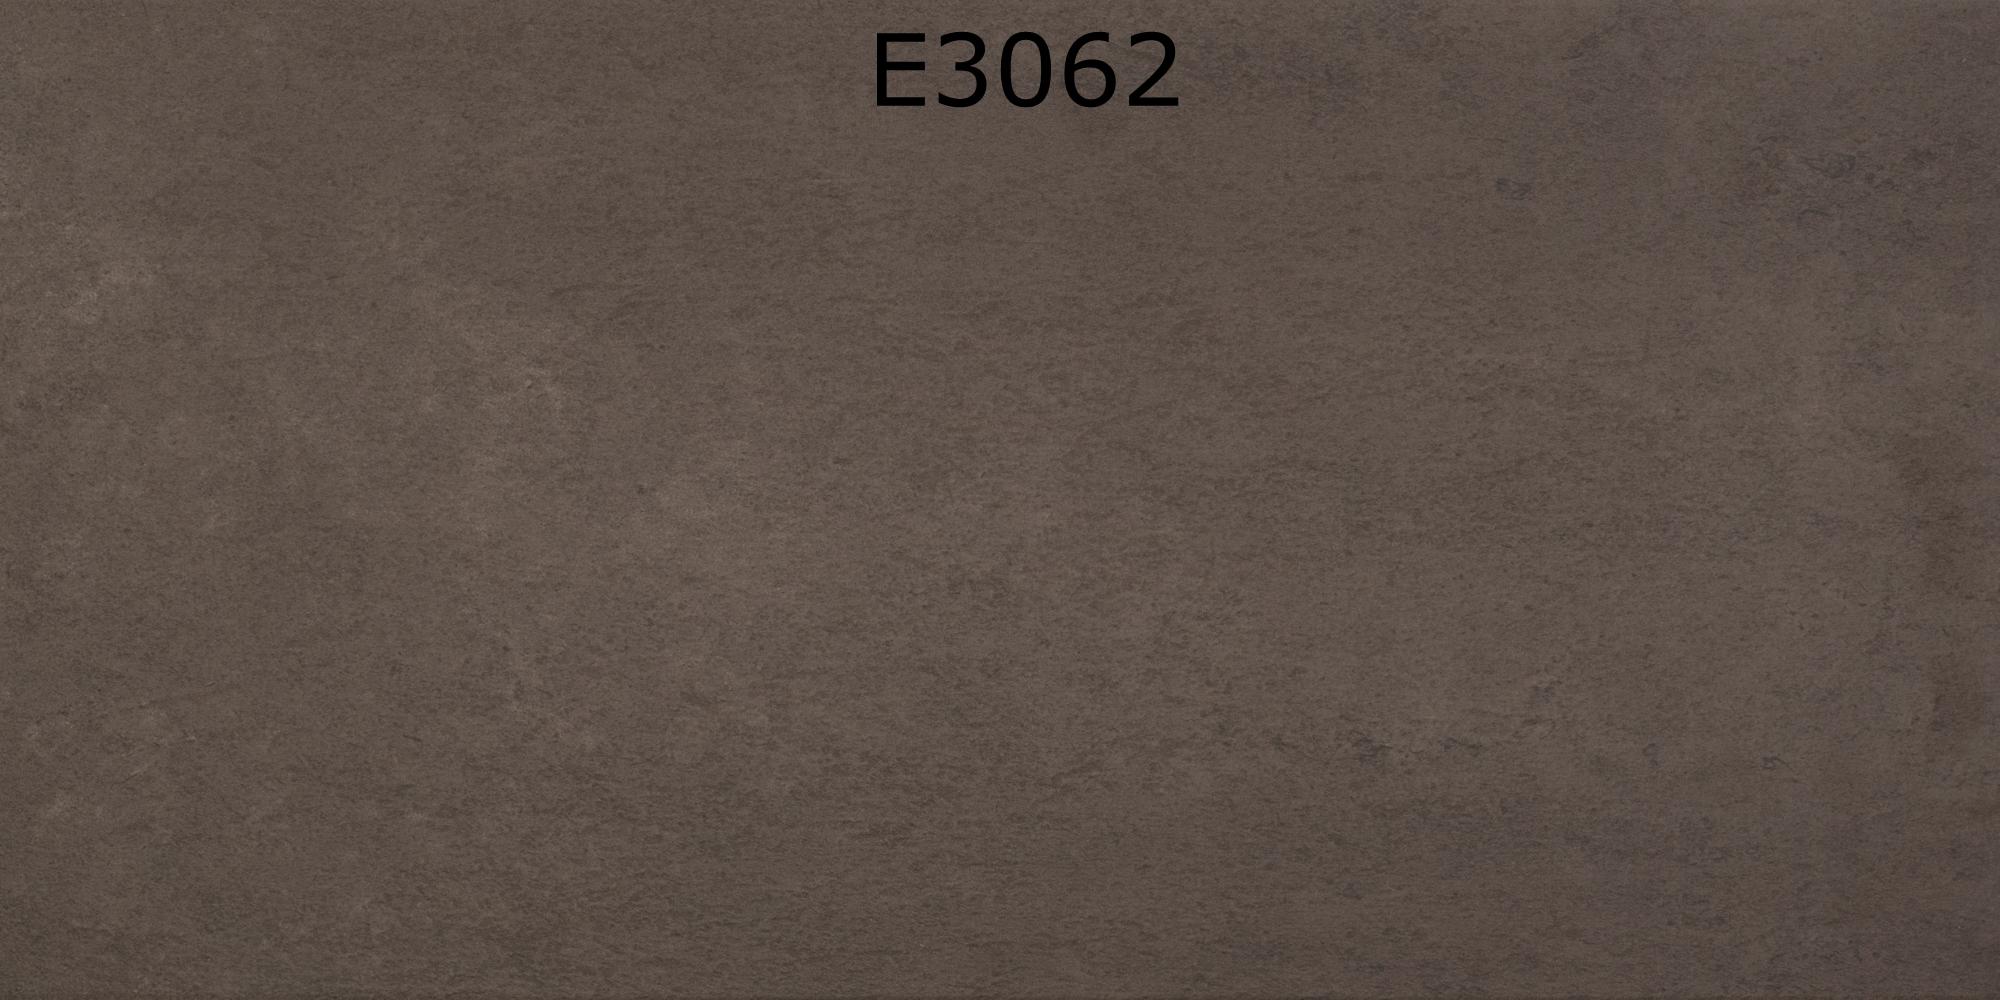 E3062